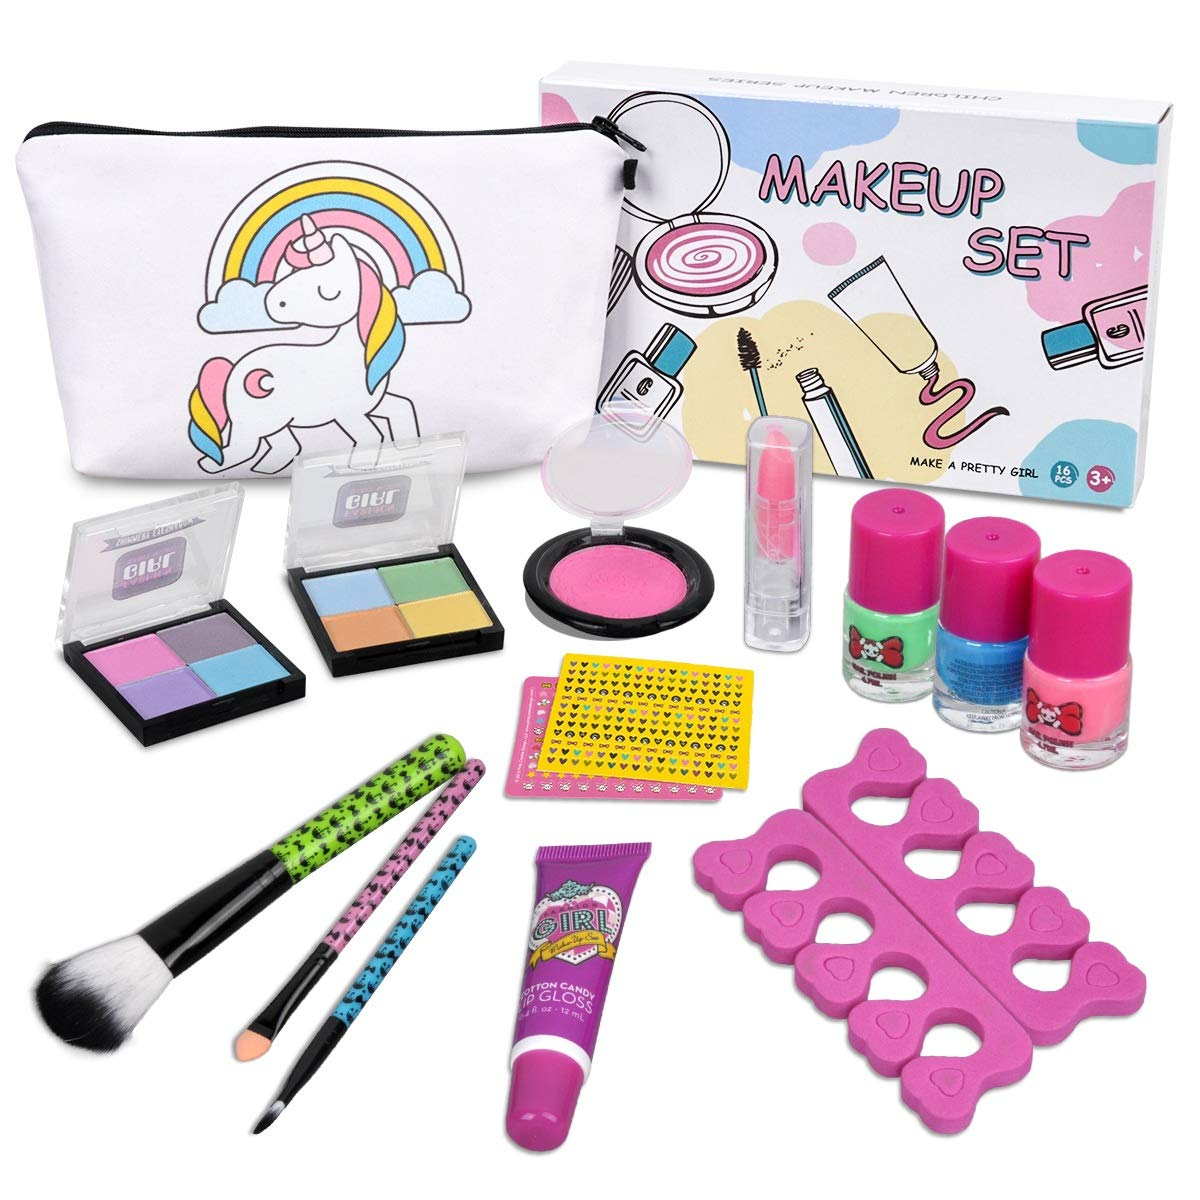 Kids Makeup Kit for Girls - Real Kids Cosmetics Make Up Set with Cute Unicorn Cosmetic Bag, Nail Polish/Eyeshadow/Lip Gloss/Blush, Washable Play Makeup for Little Girls Xmas Birthday Gift by LOYO